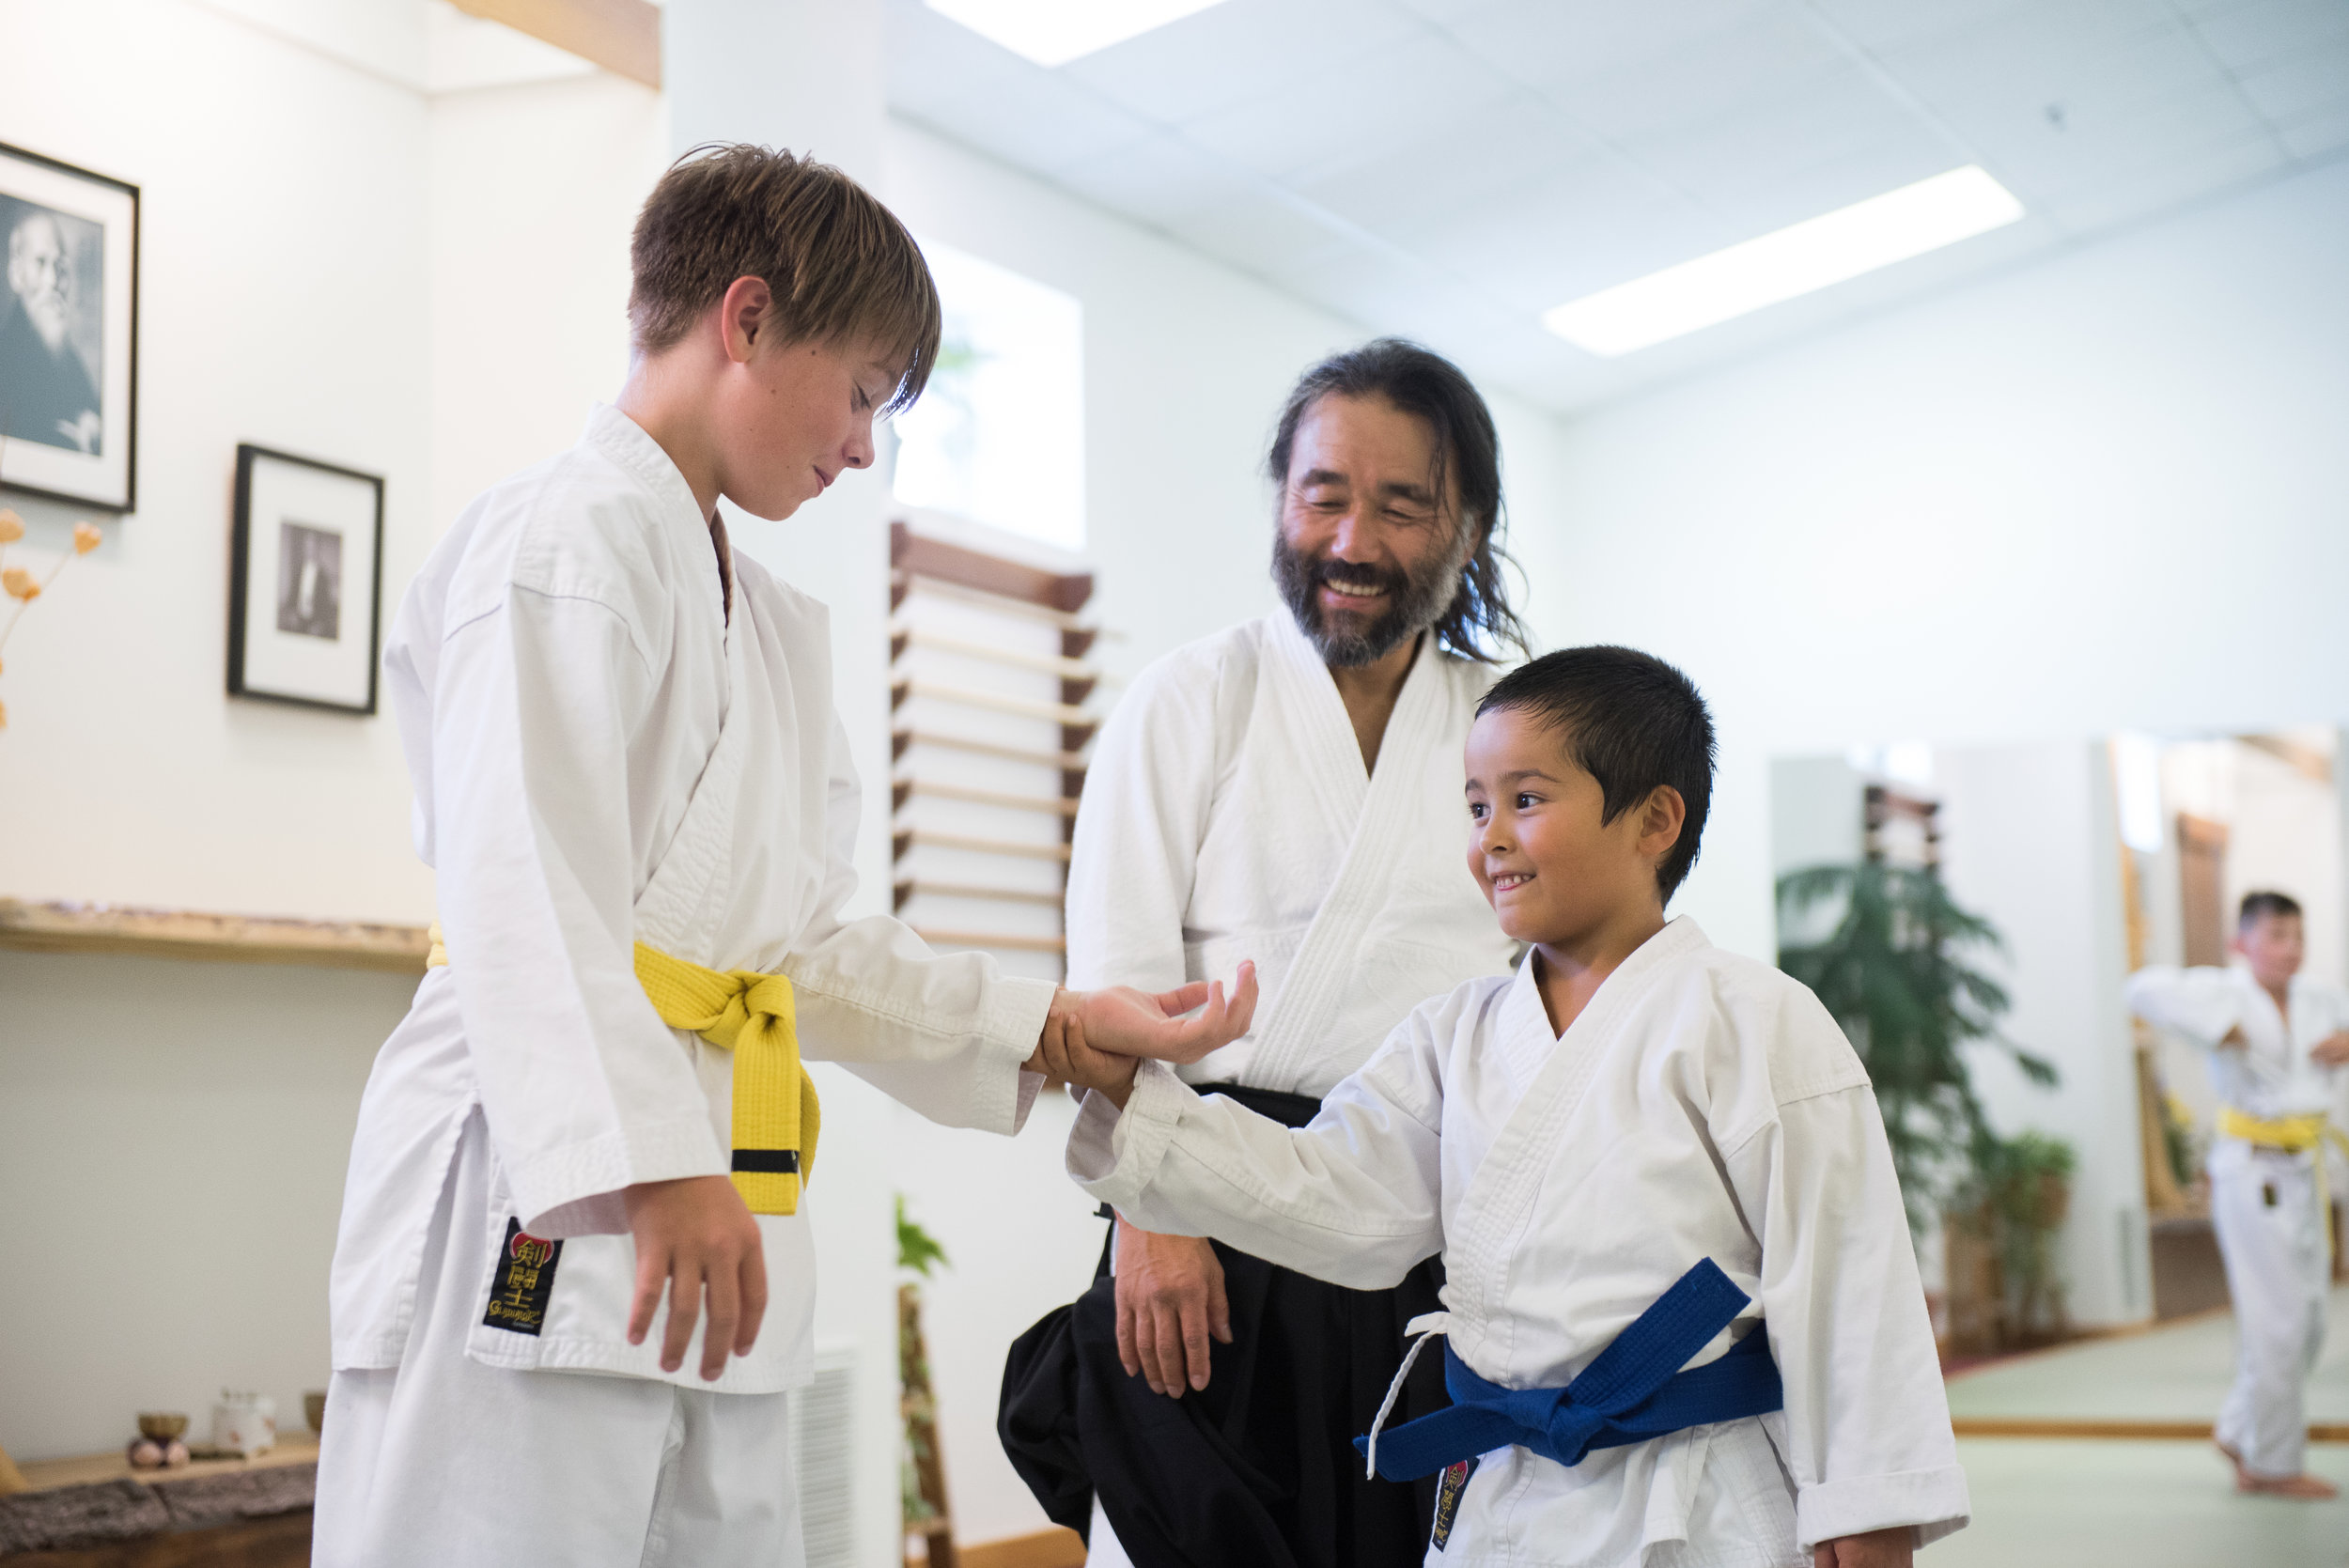 Yoshi teaching.jpg